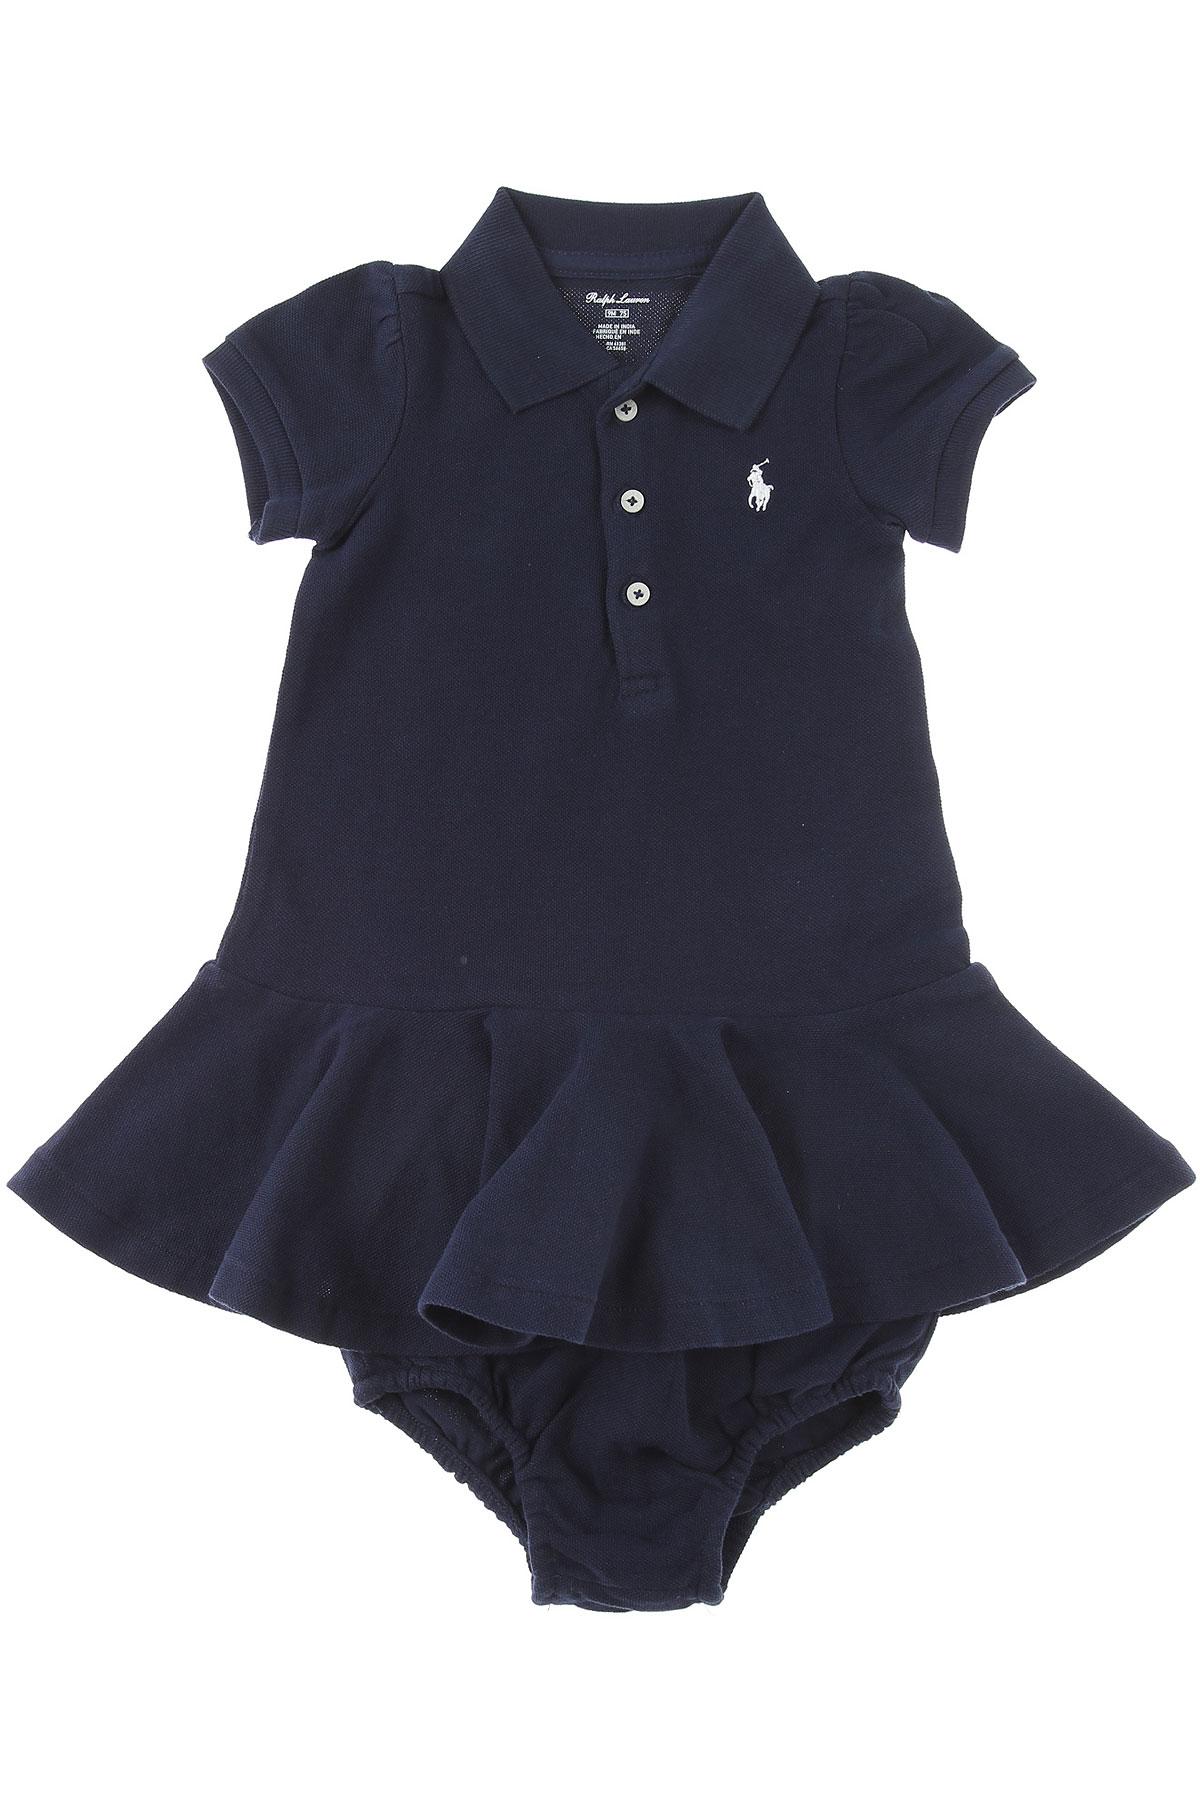 Ralph Lauren Baby Dress for Girls On Sale, navy, Cotton, 2019, 12M 18M 2Y 6M 9M